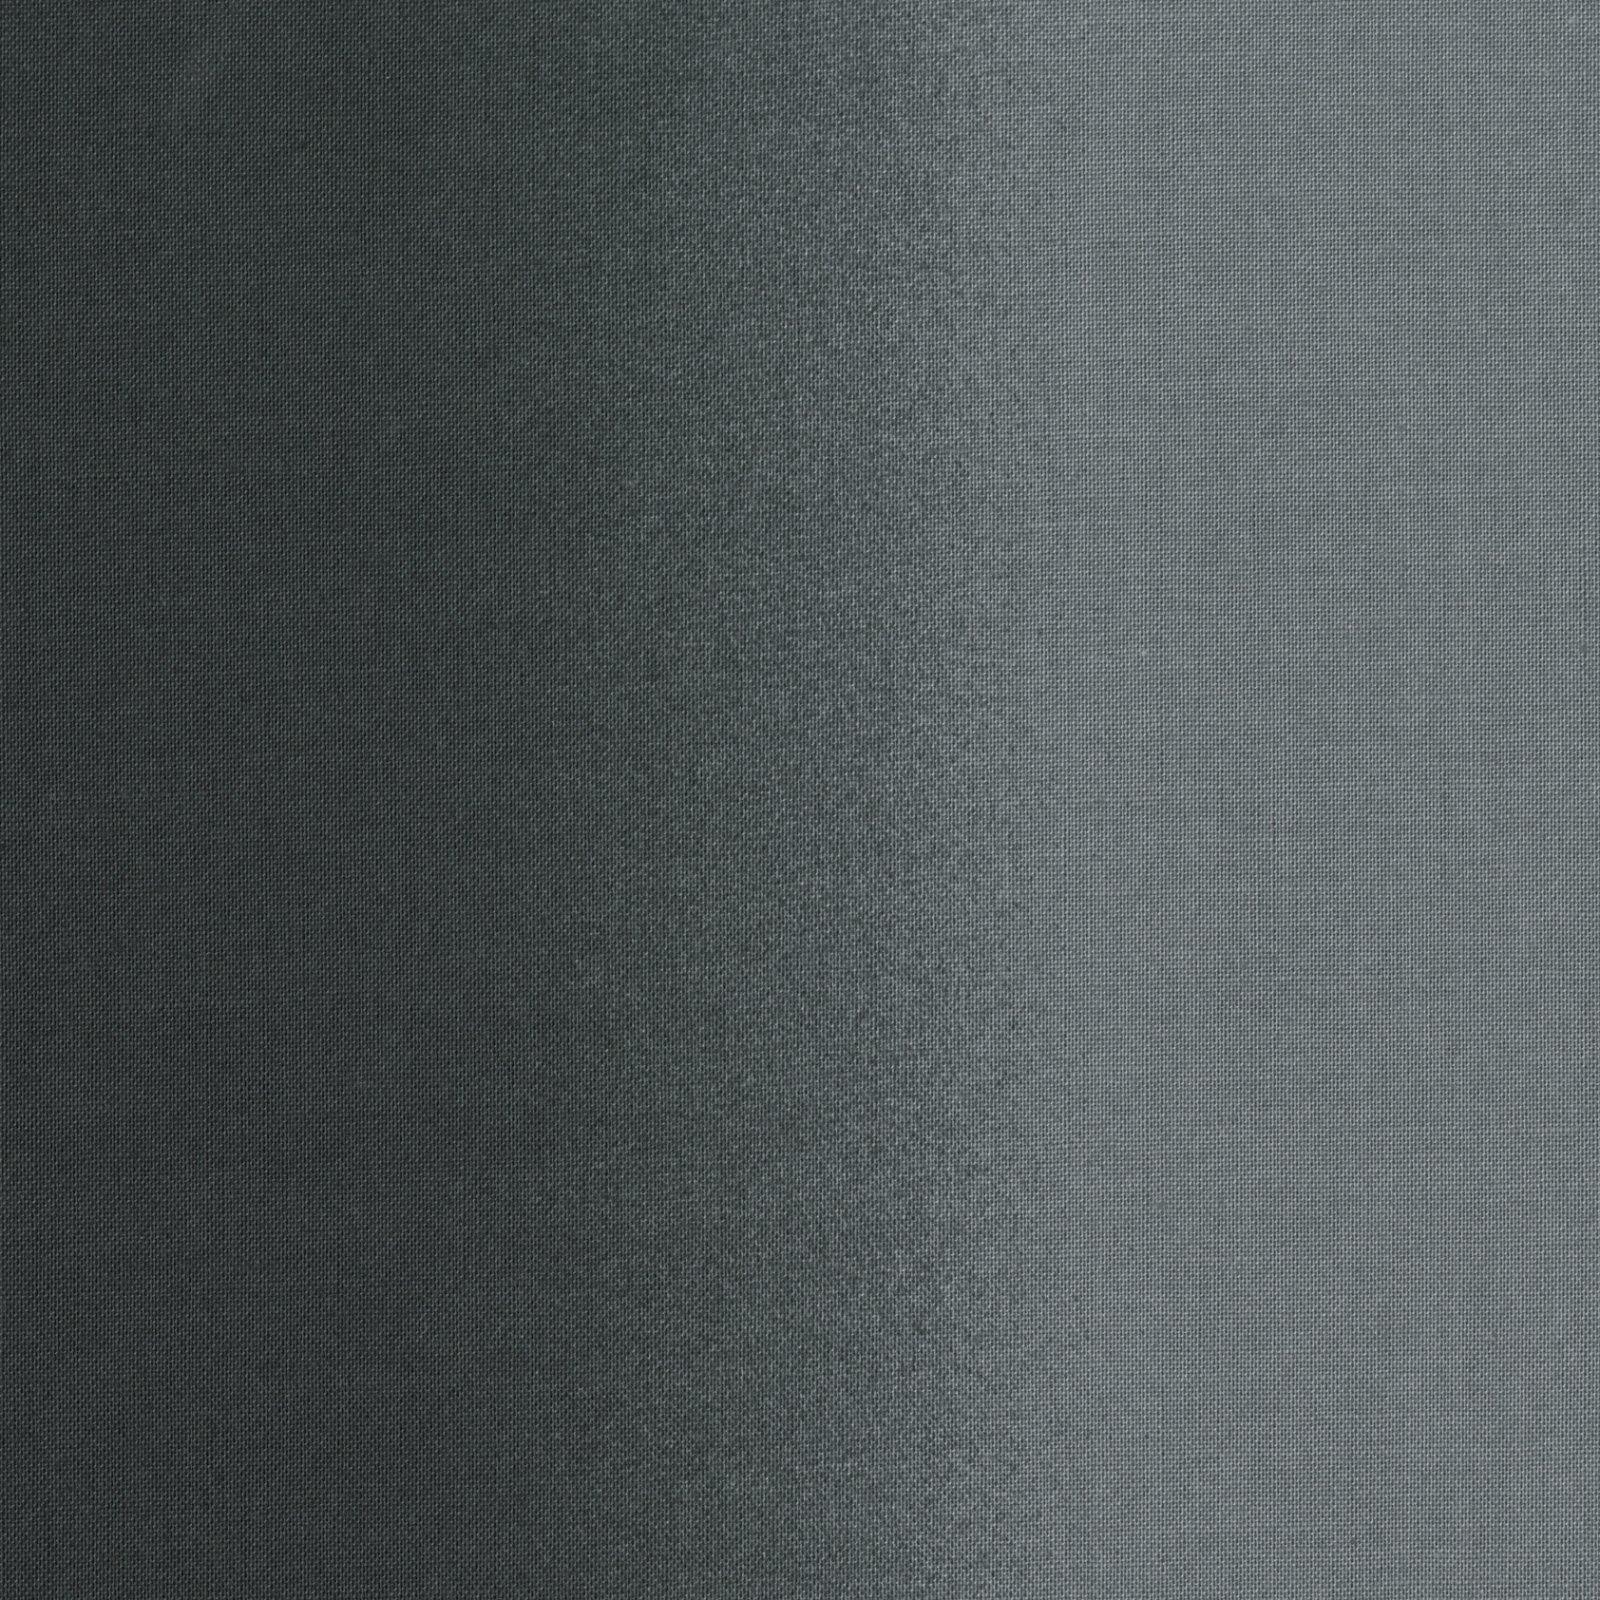 Shades by Kinkame - Dark Gray